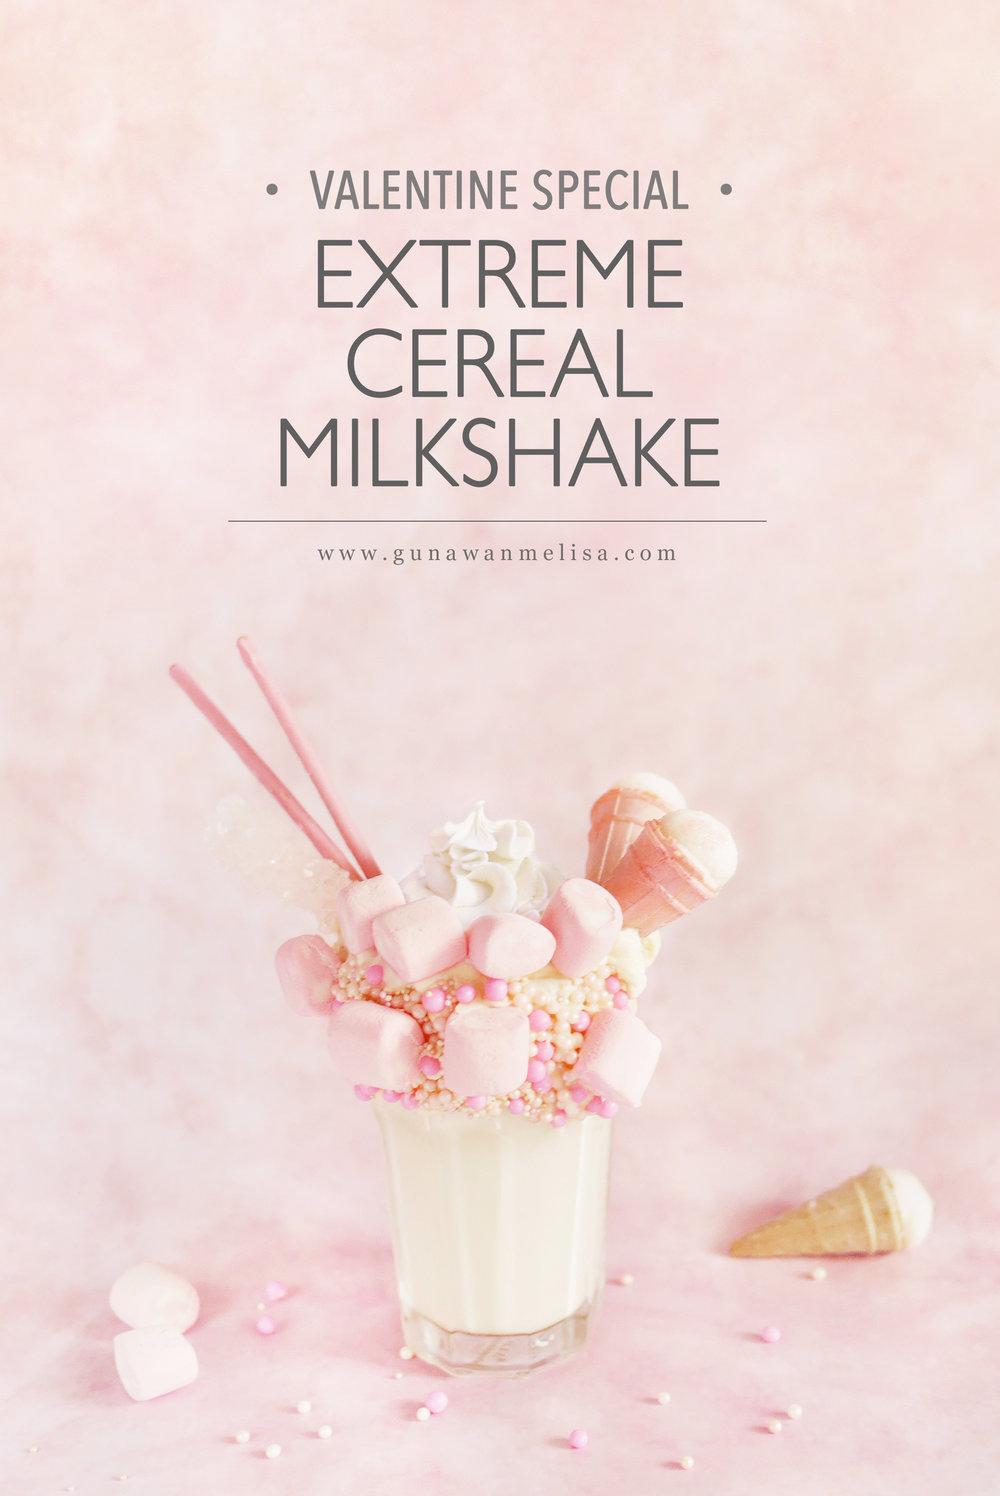 ExtremeCerealMilkshake01